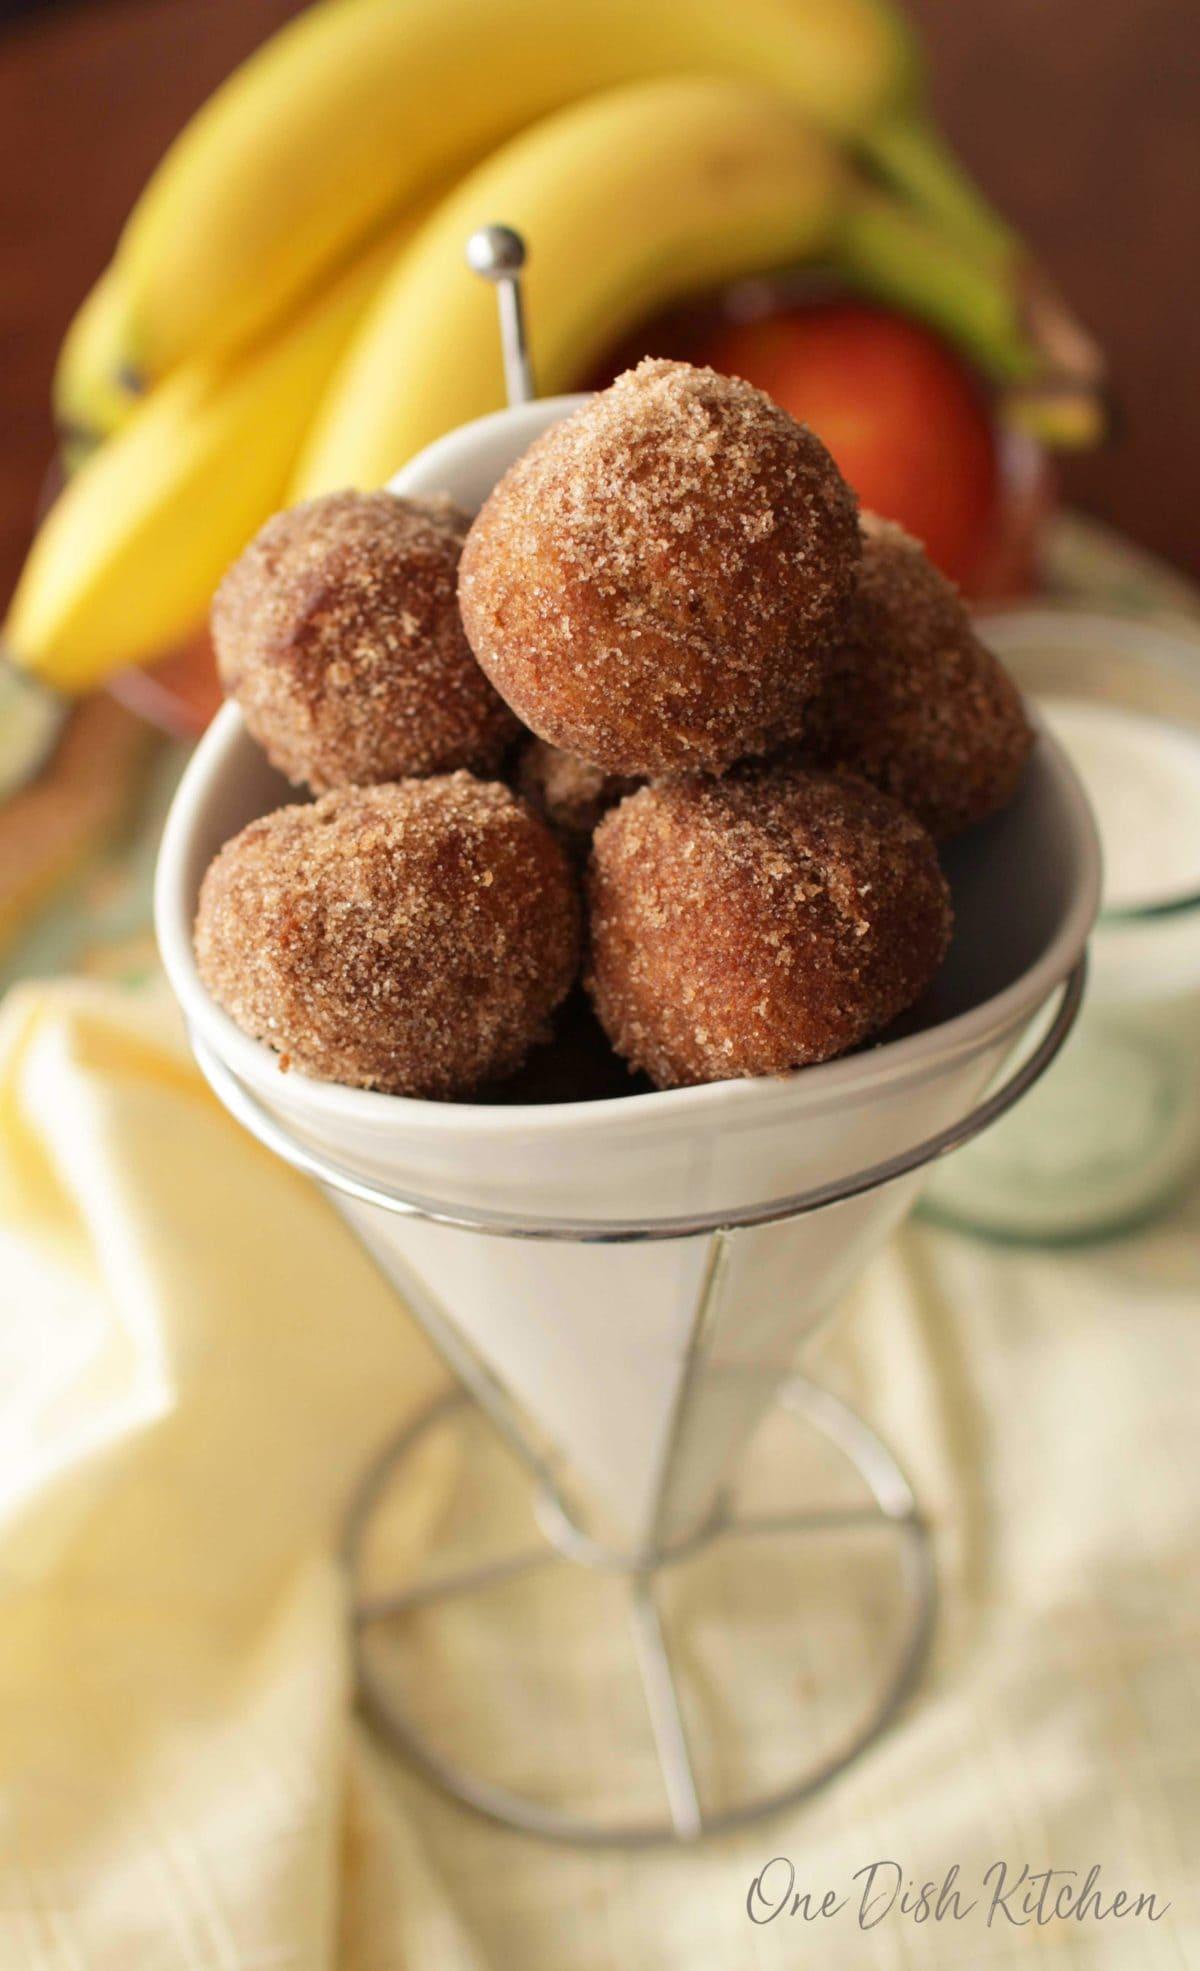 A closeup of a bowl of cinnamon sugar donut holes